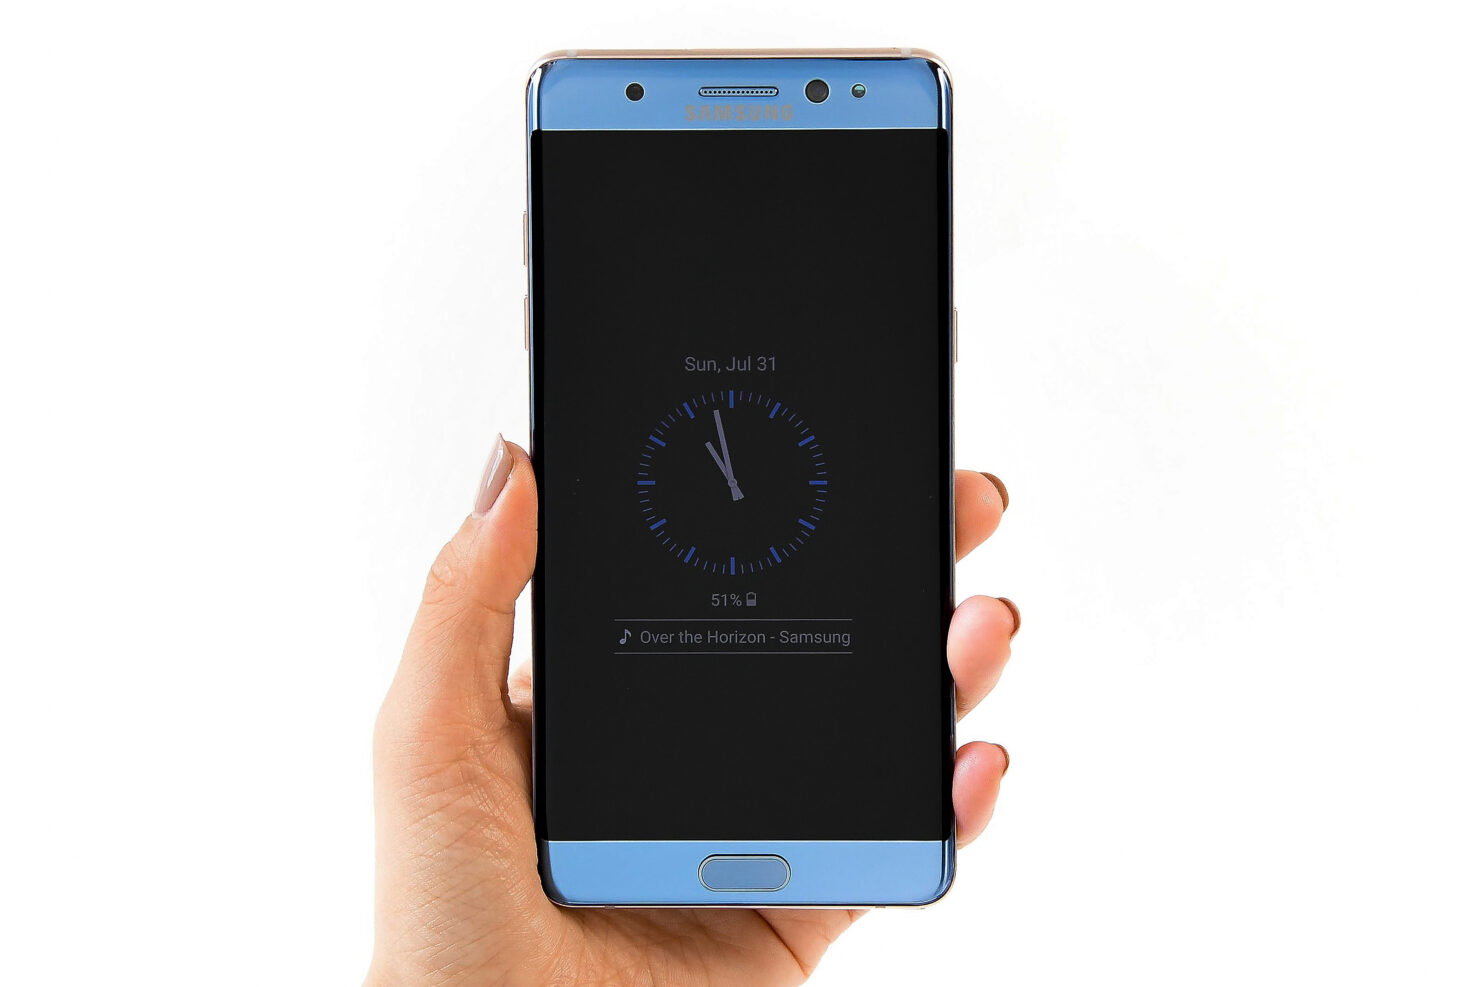 Galaxy Note7 Fan Edition